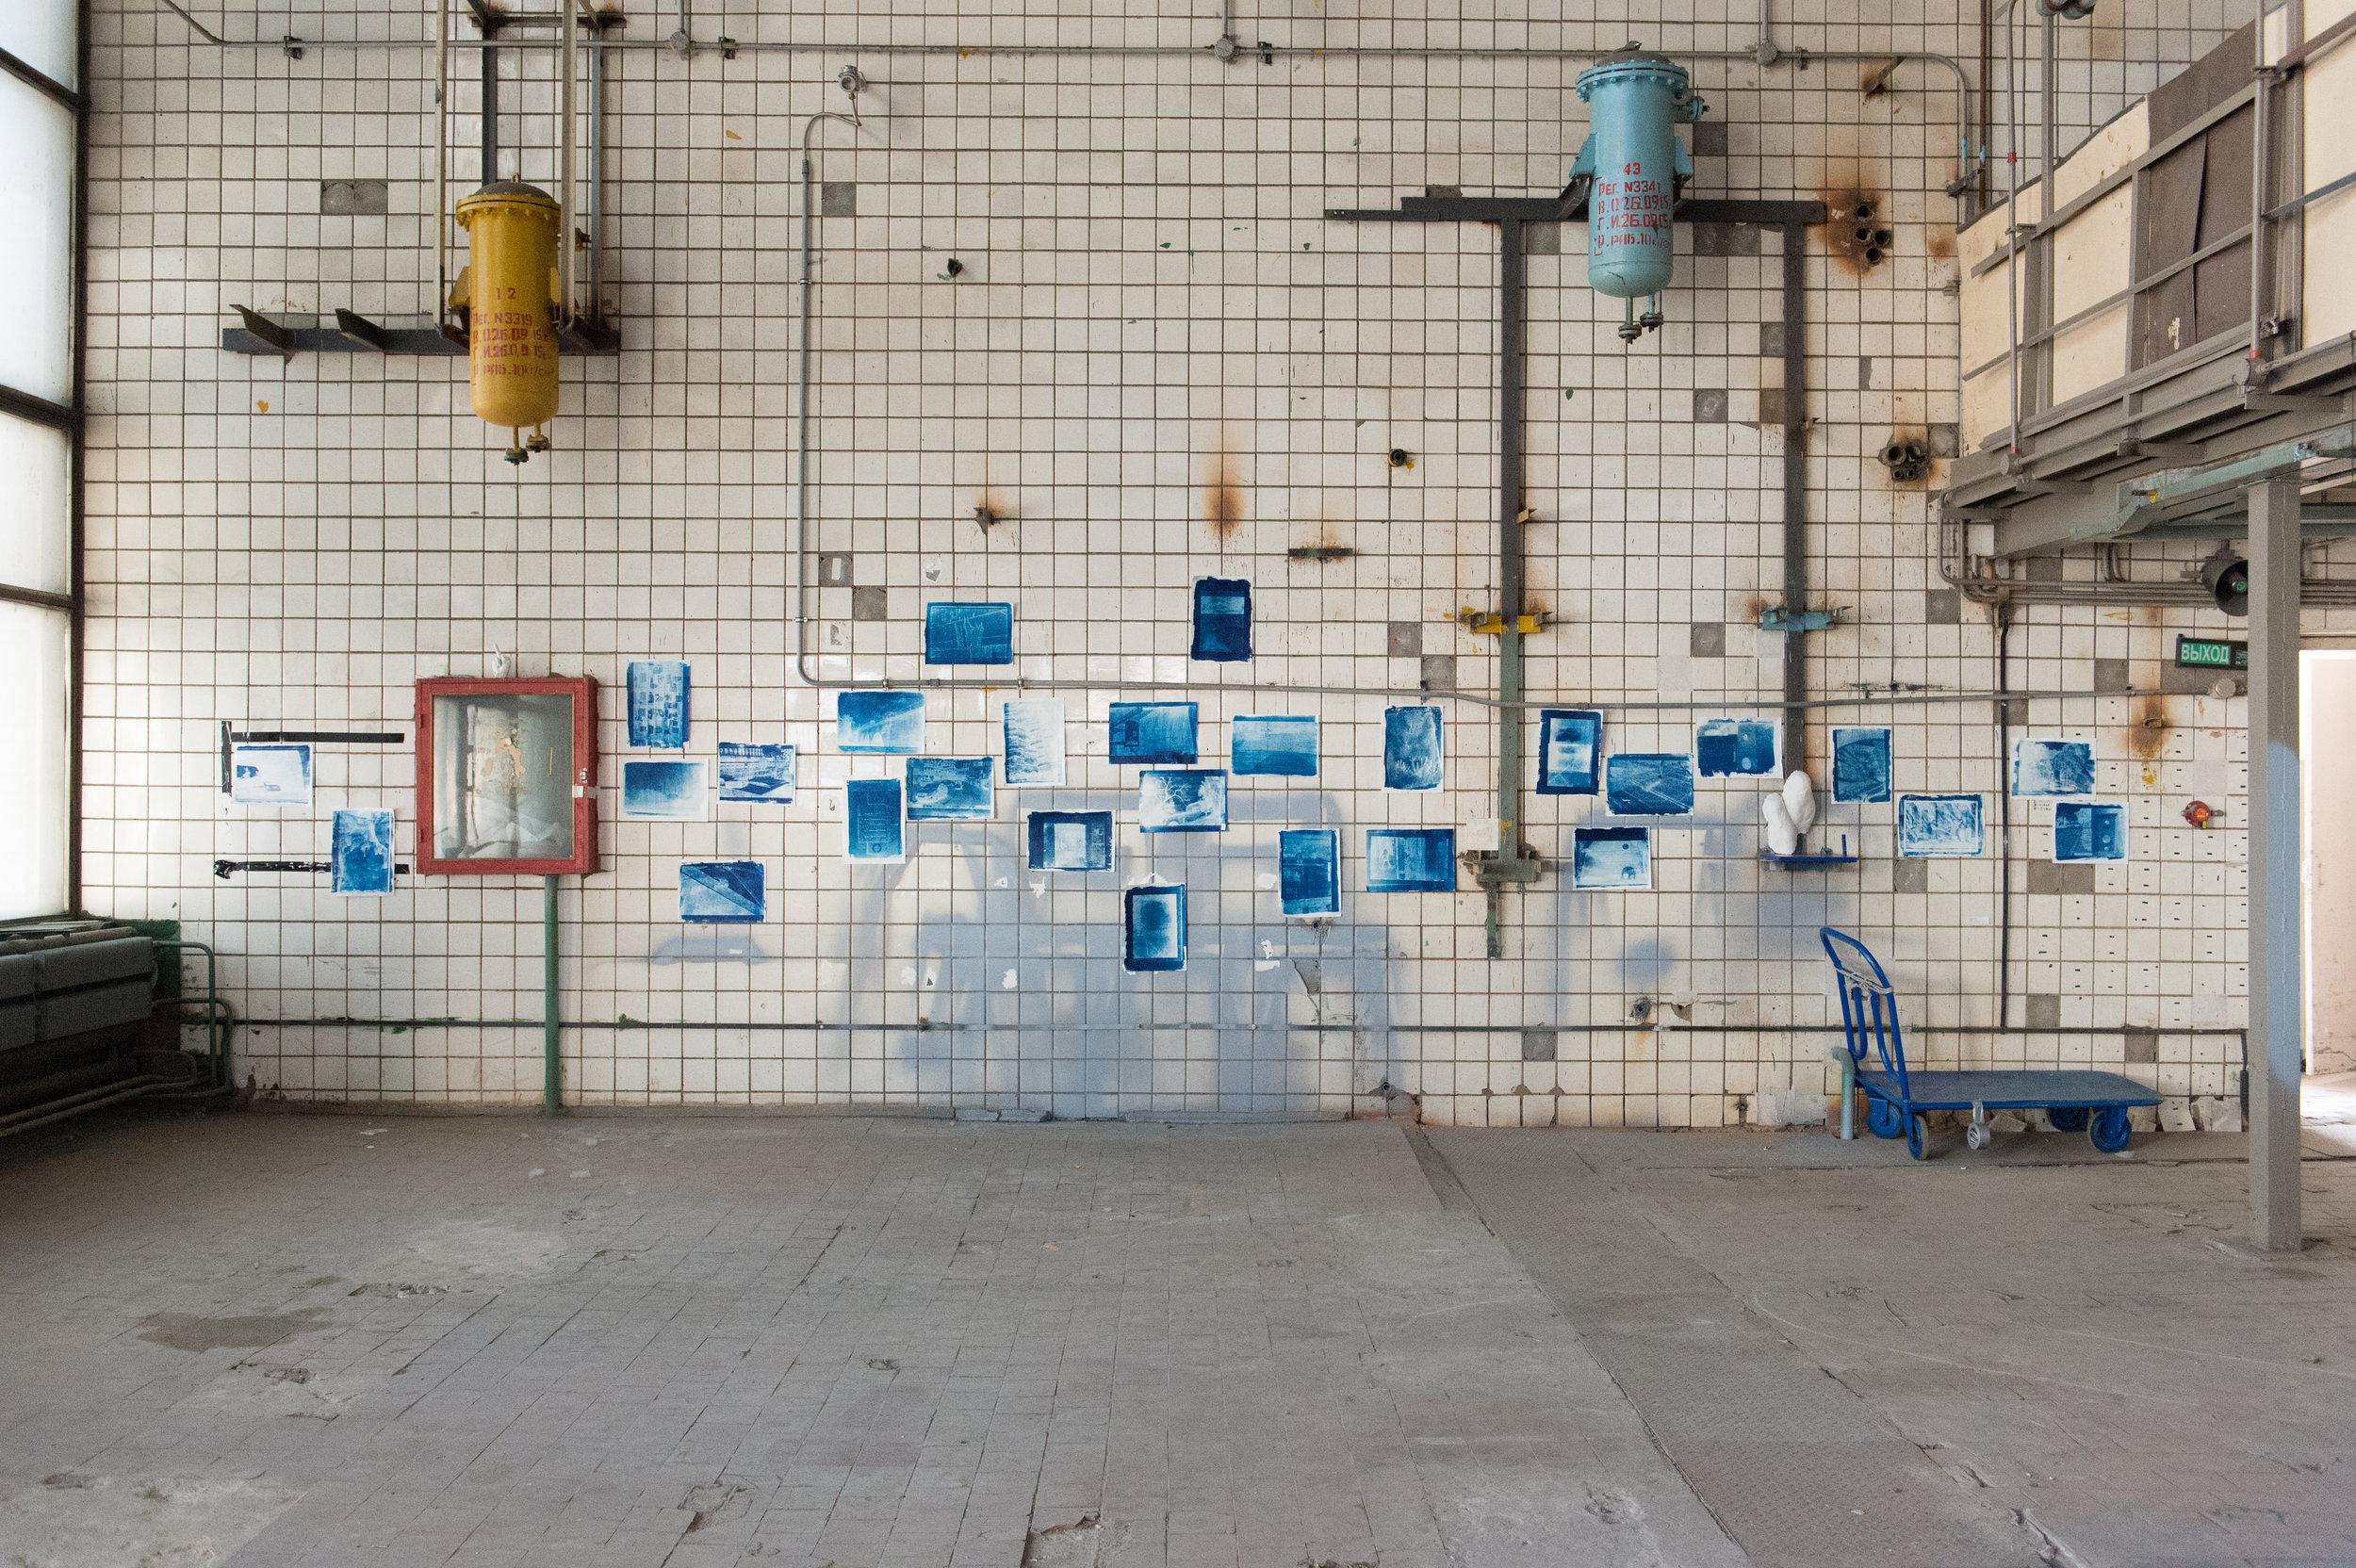 20170706_ContemporaryArt_Exhibition_8860.jpg